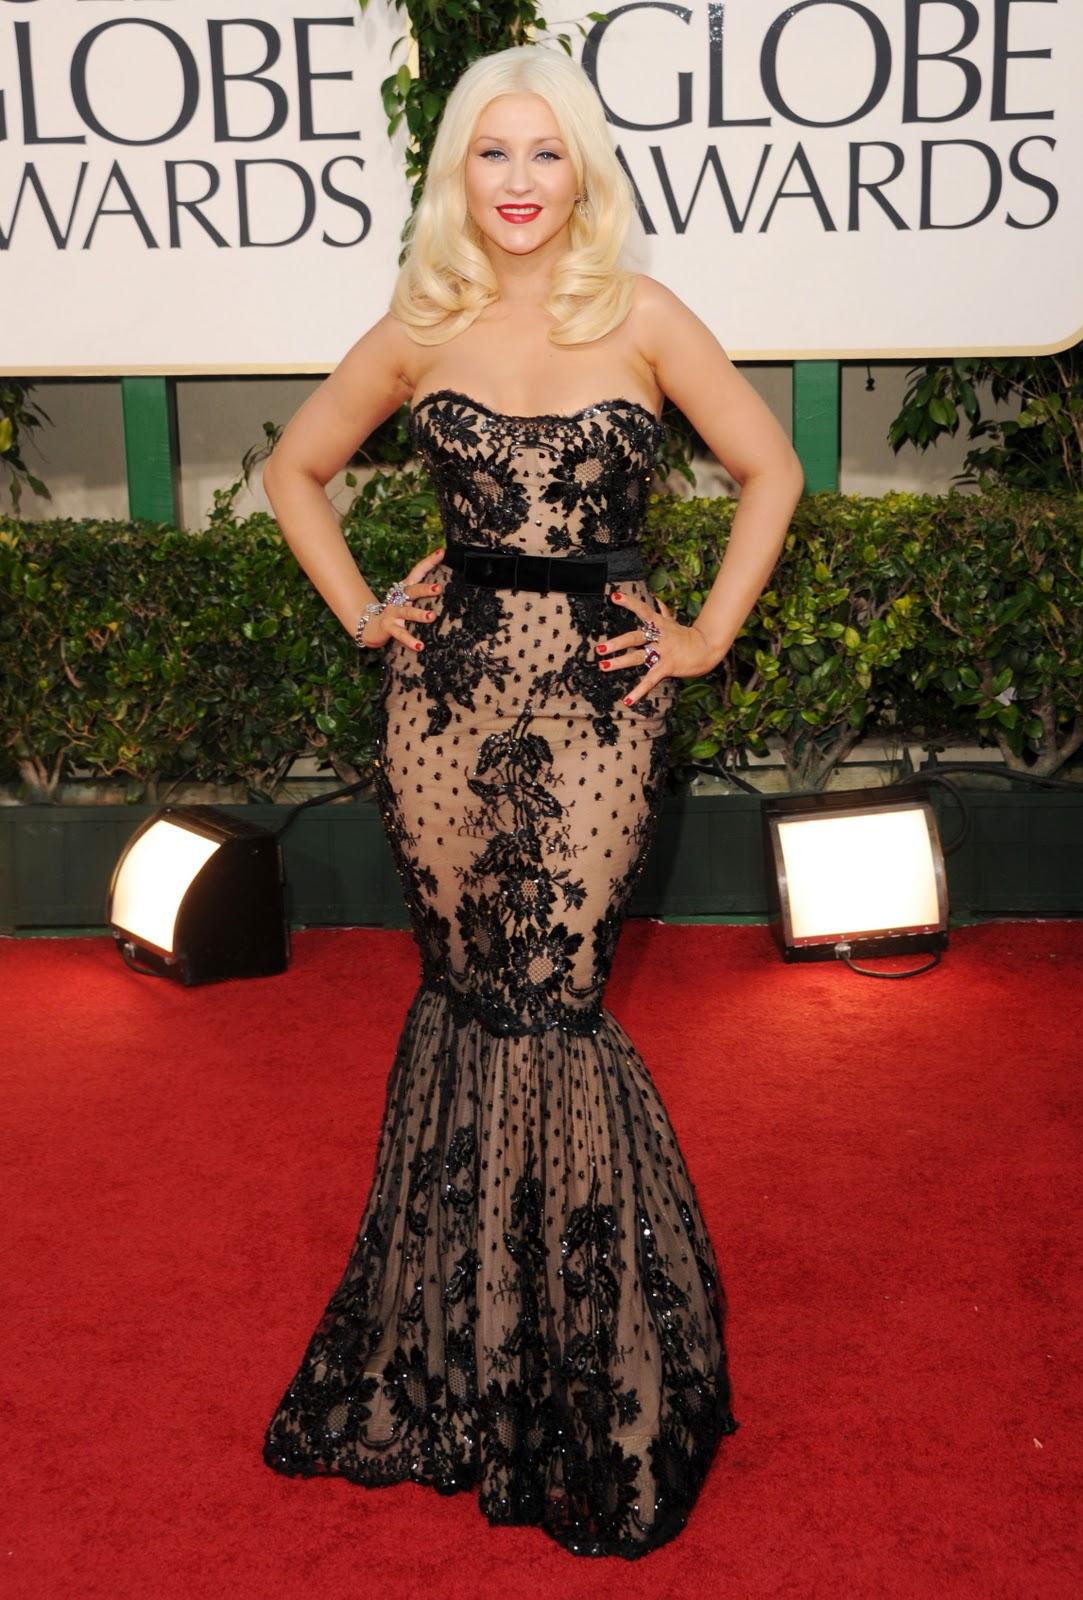 http://1.bp.blogspot.com/_prOe4Hc8qRM/TTn43NOLWfI/AAAAAAAAAPM/QkDpAa_xPns/s1600/35848_Tikipeter_Christina_Aguilera_68th_Annual_Golden_Globe_Awards_028_122_182lo.jpg